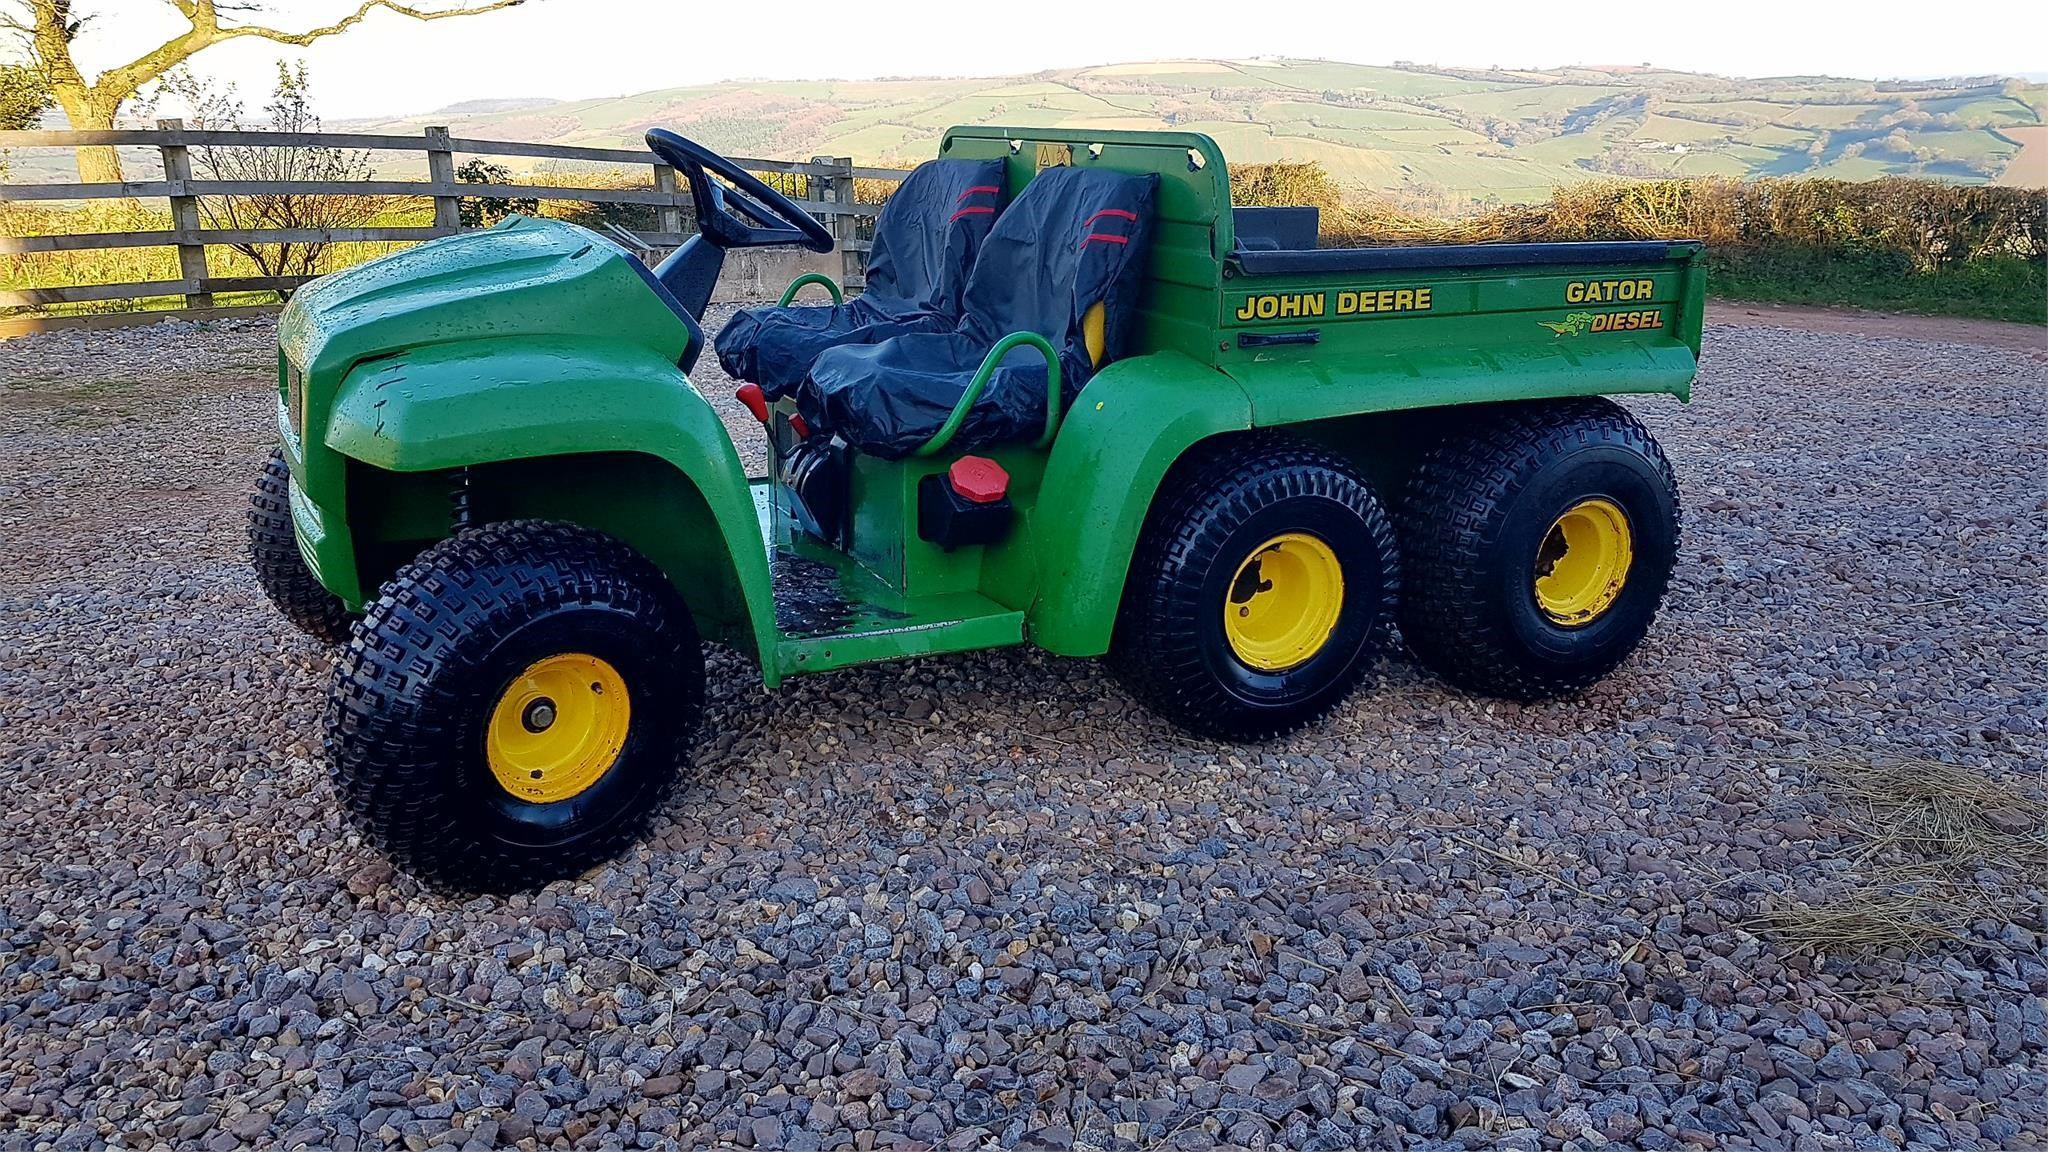 John Deere Gator >> John Deere Gator For Sale In Devon Motorsportsuniverse Com